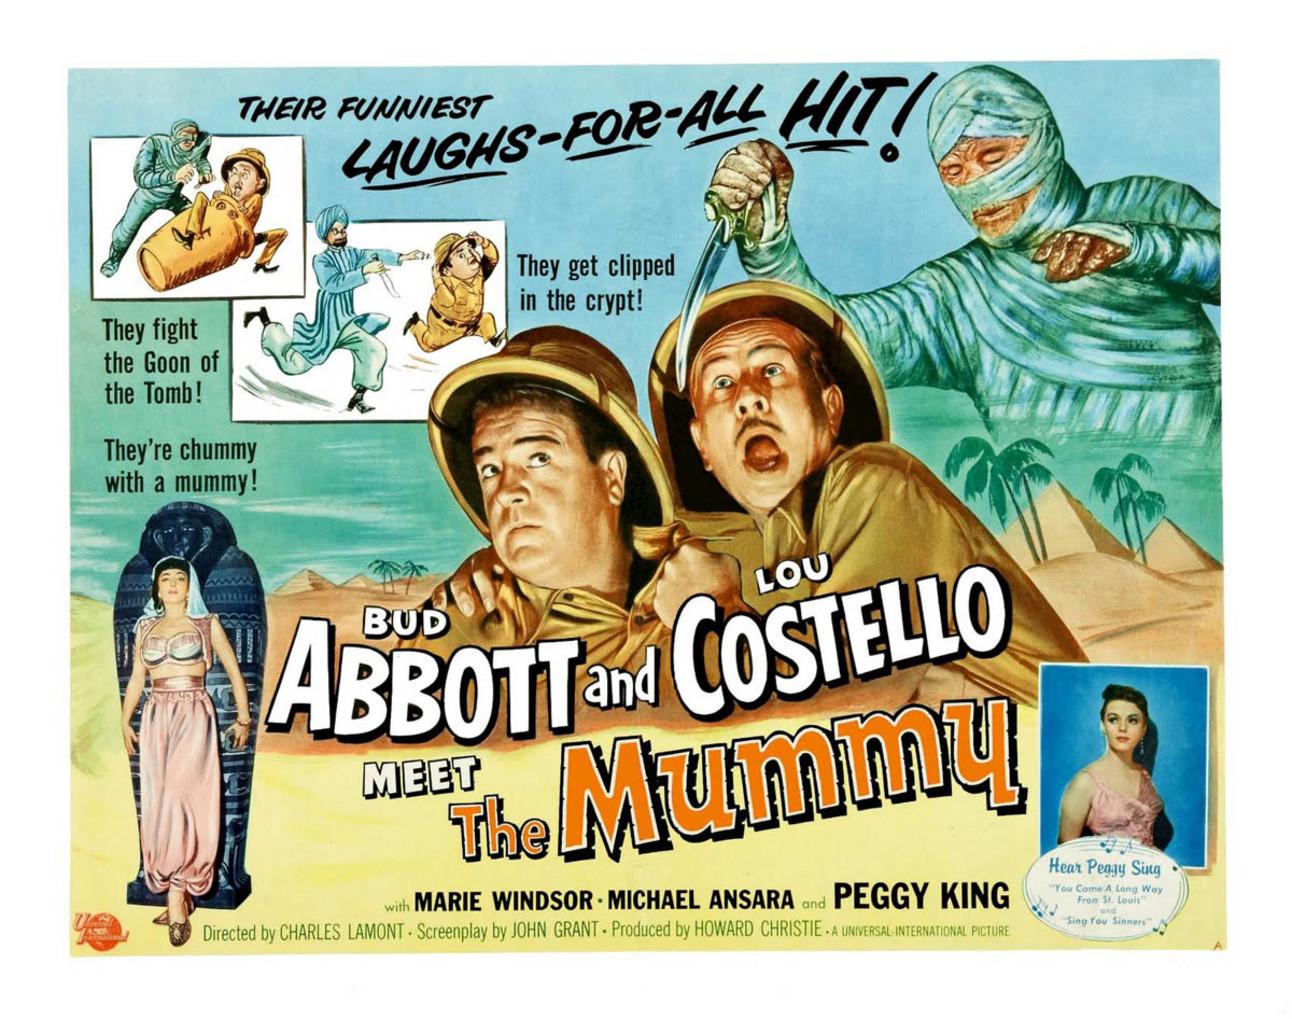 abbott-and-costello-meet-the-mummy.jpeg